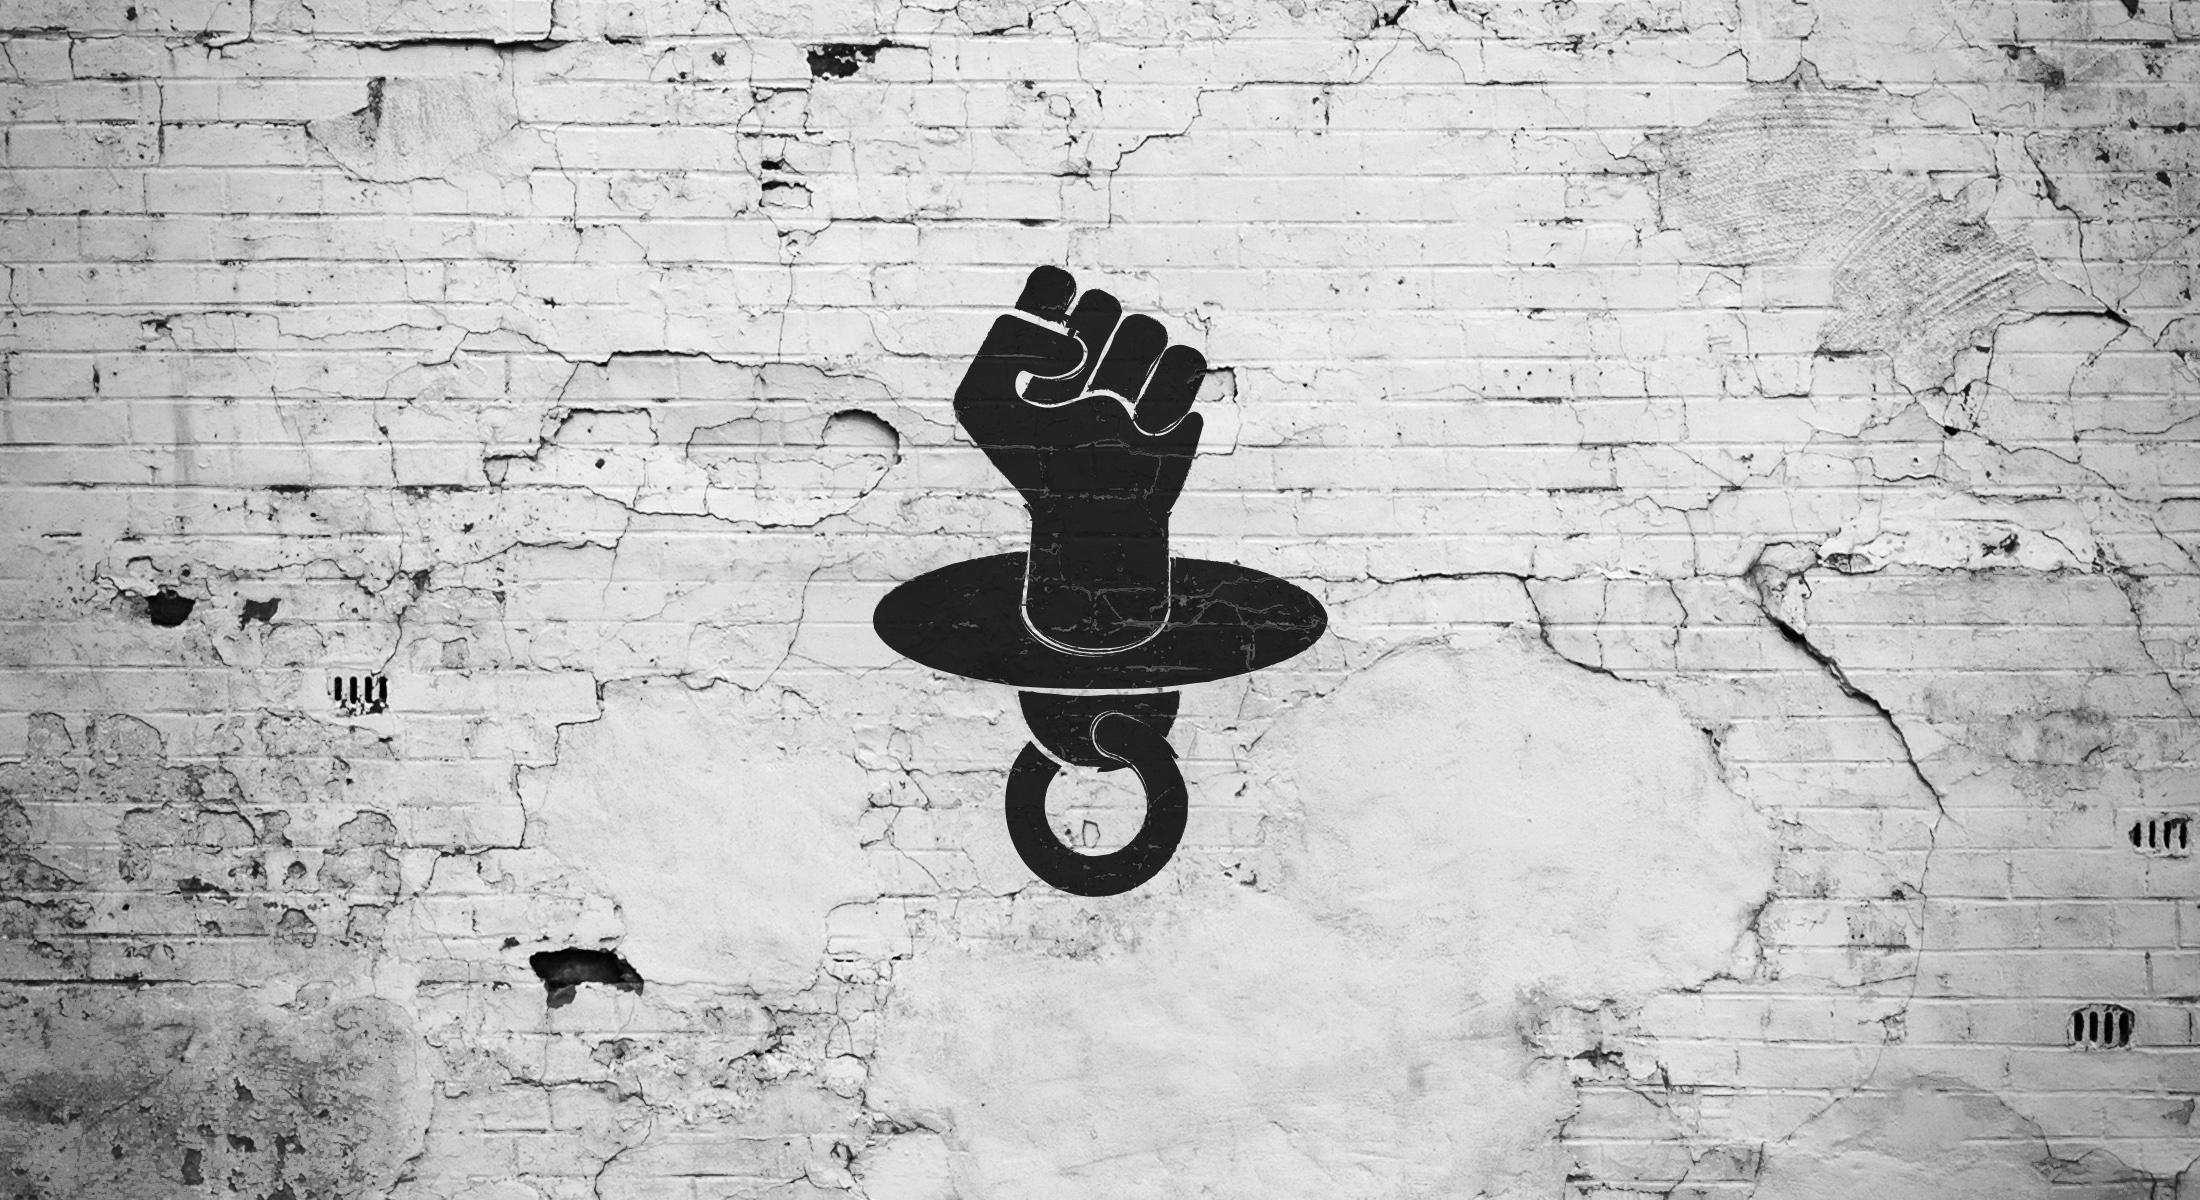 bebolucija-what-remains-after-plenums-activist-citizenship-language-of-the-new-political